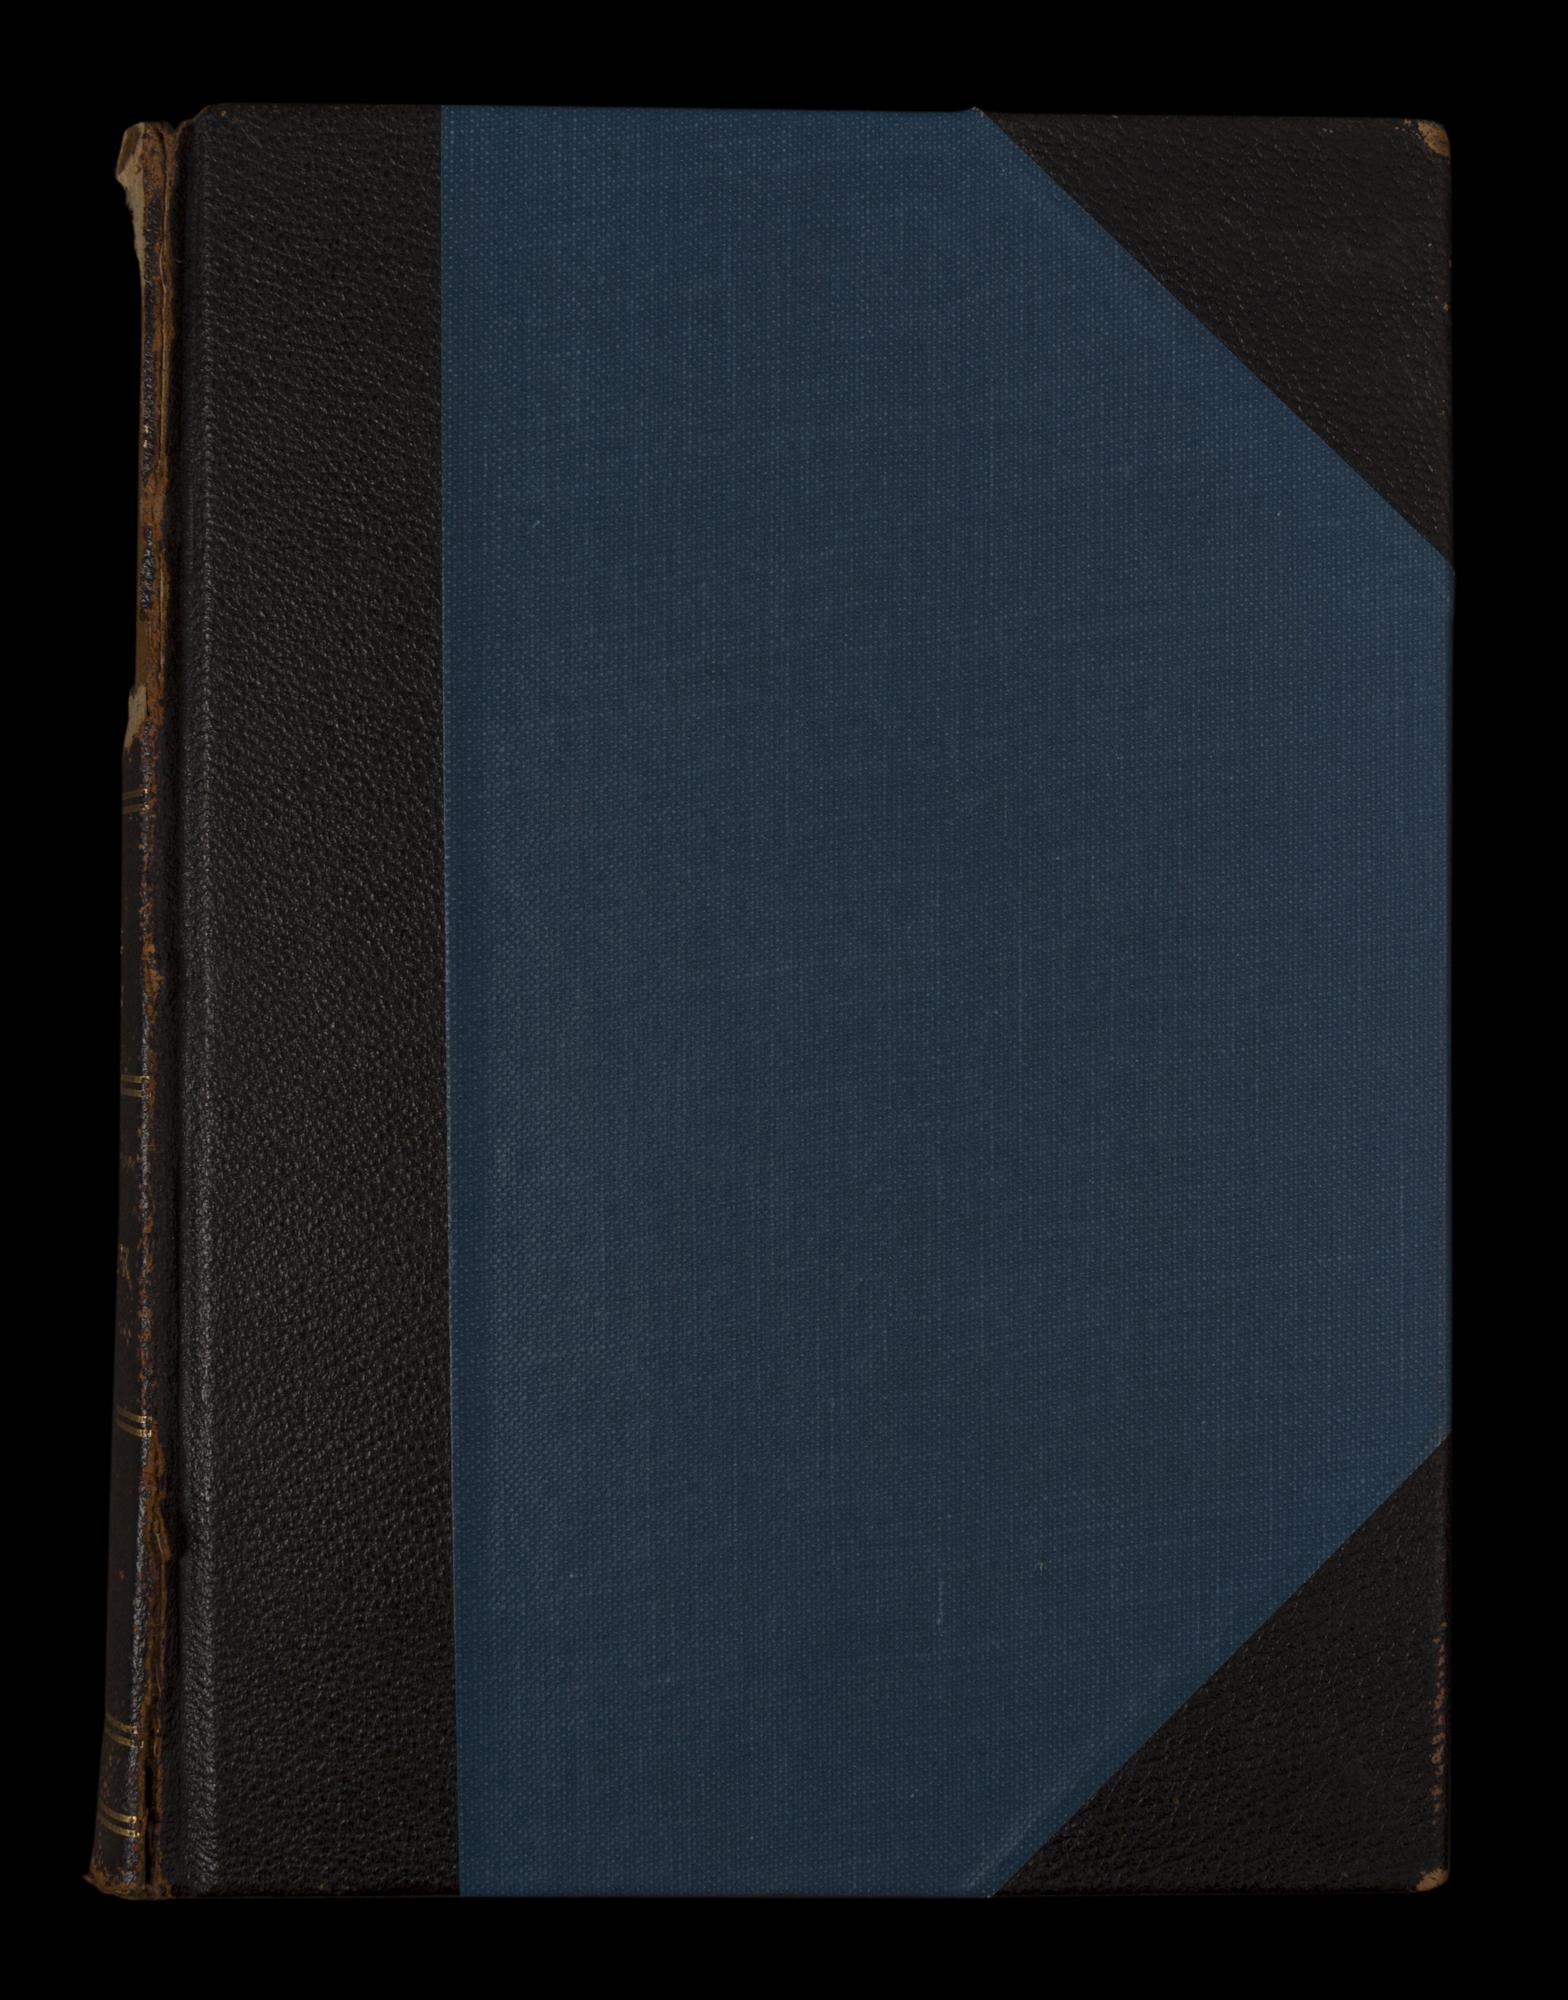 LAPO_ProgramBook_Cover_1926-1927.jpg